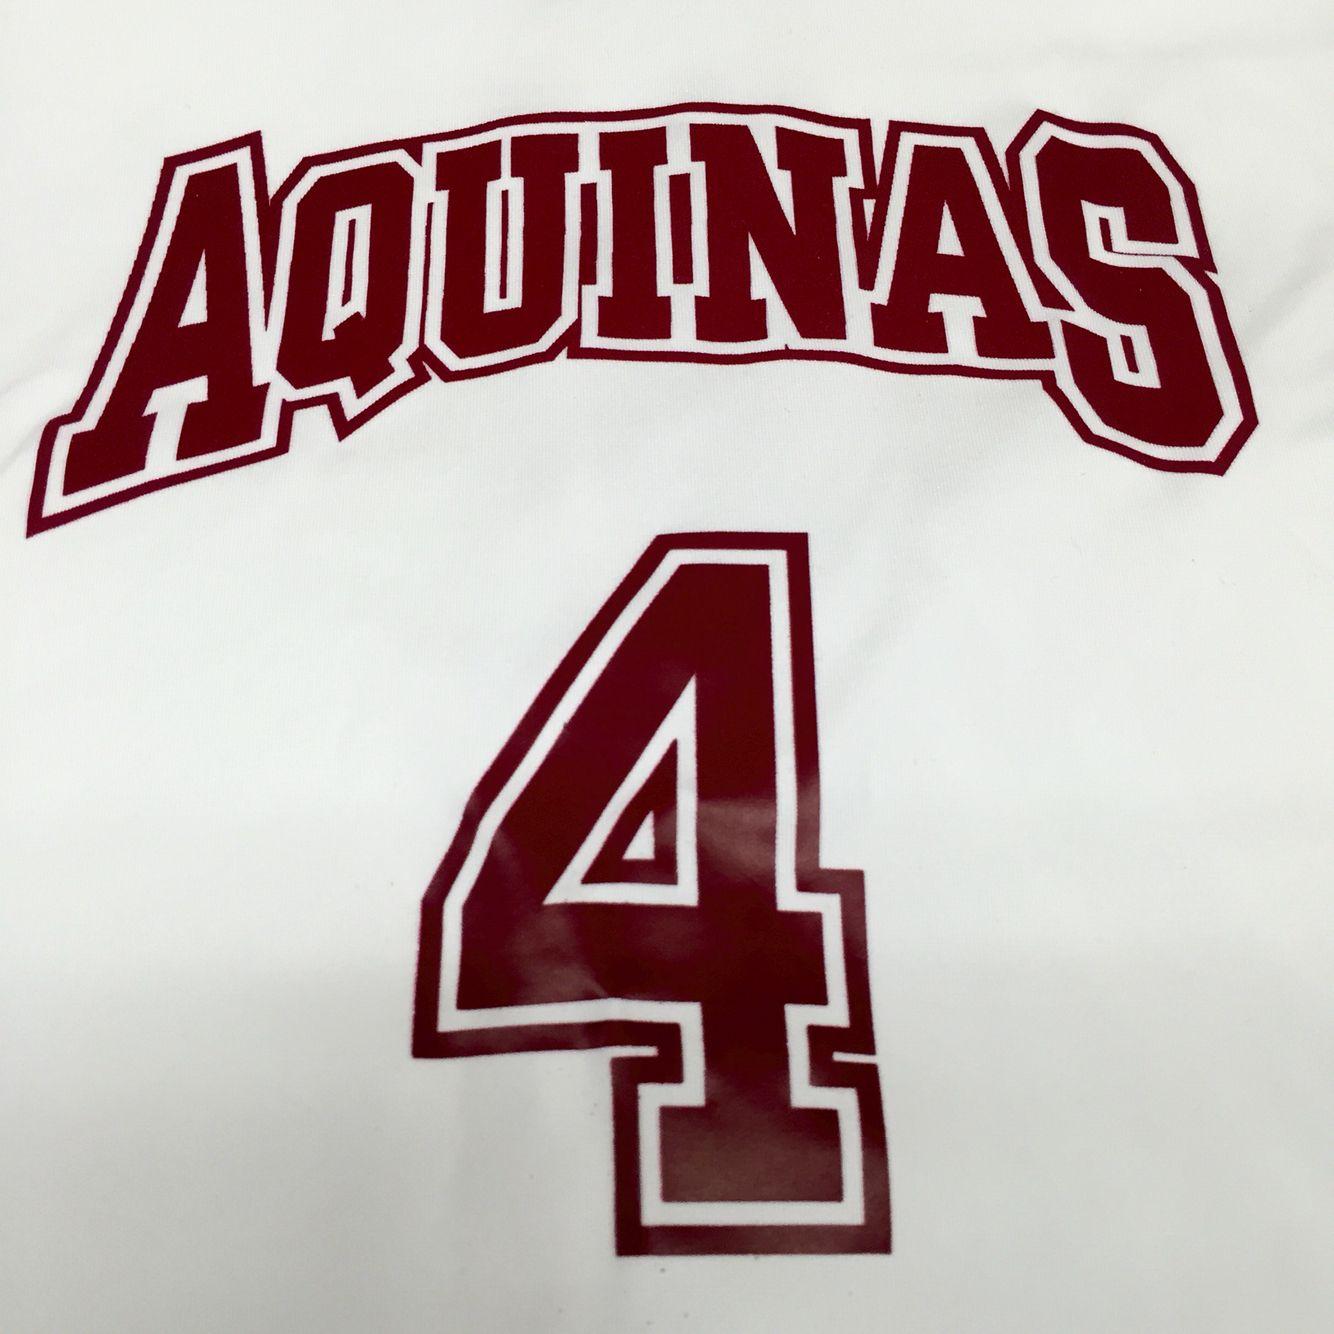 Brand new jerseys for the Aquinas Girls' Varsity Soccer Team! #design #custom #graphicdesign #embroidery #screenprinting #tshirt #apparel #soccer #jersey #team